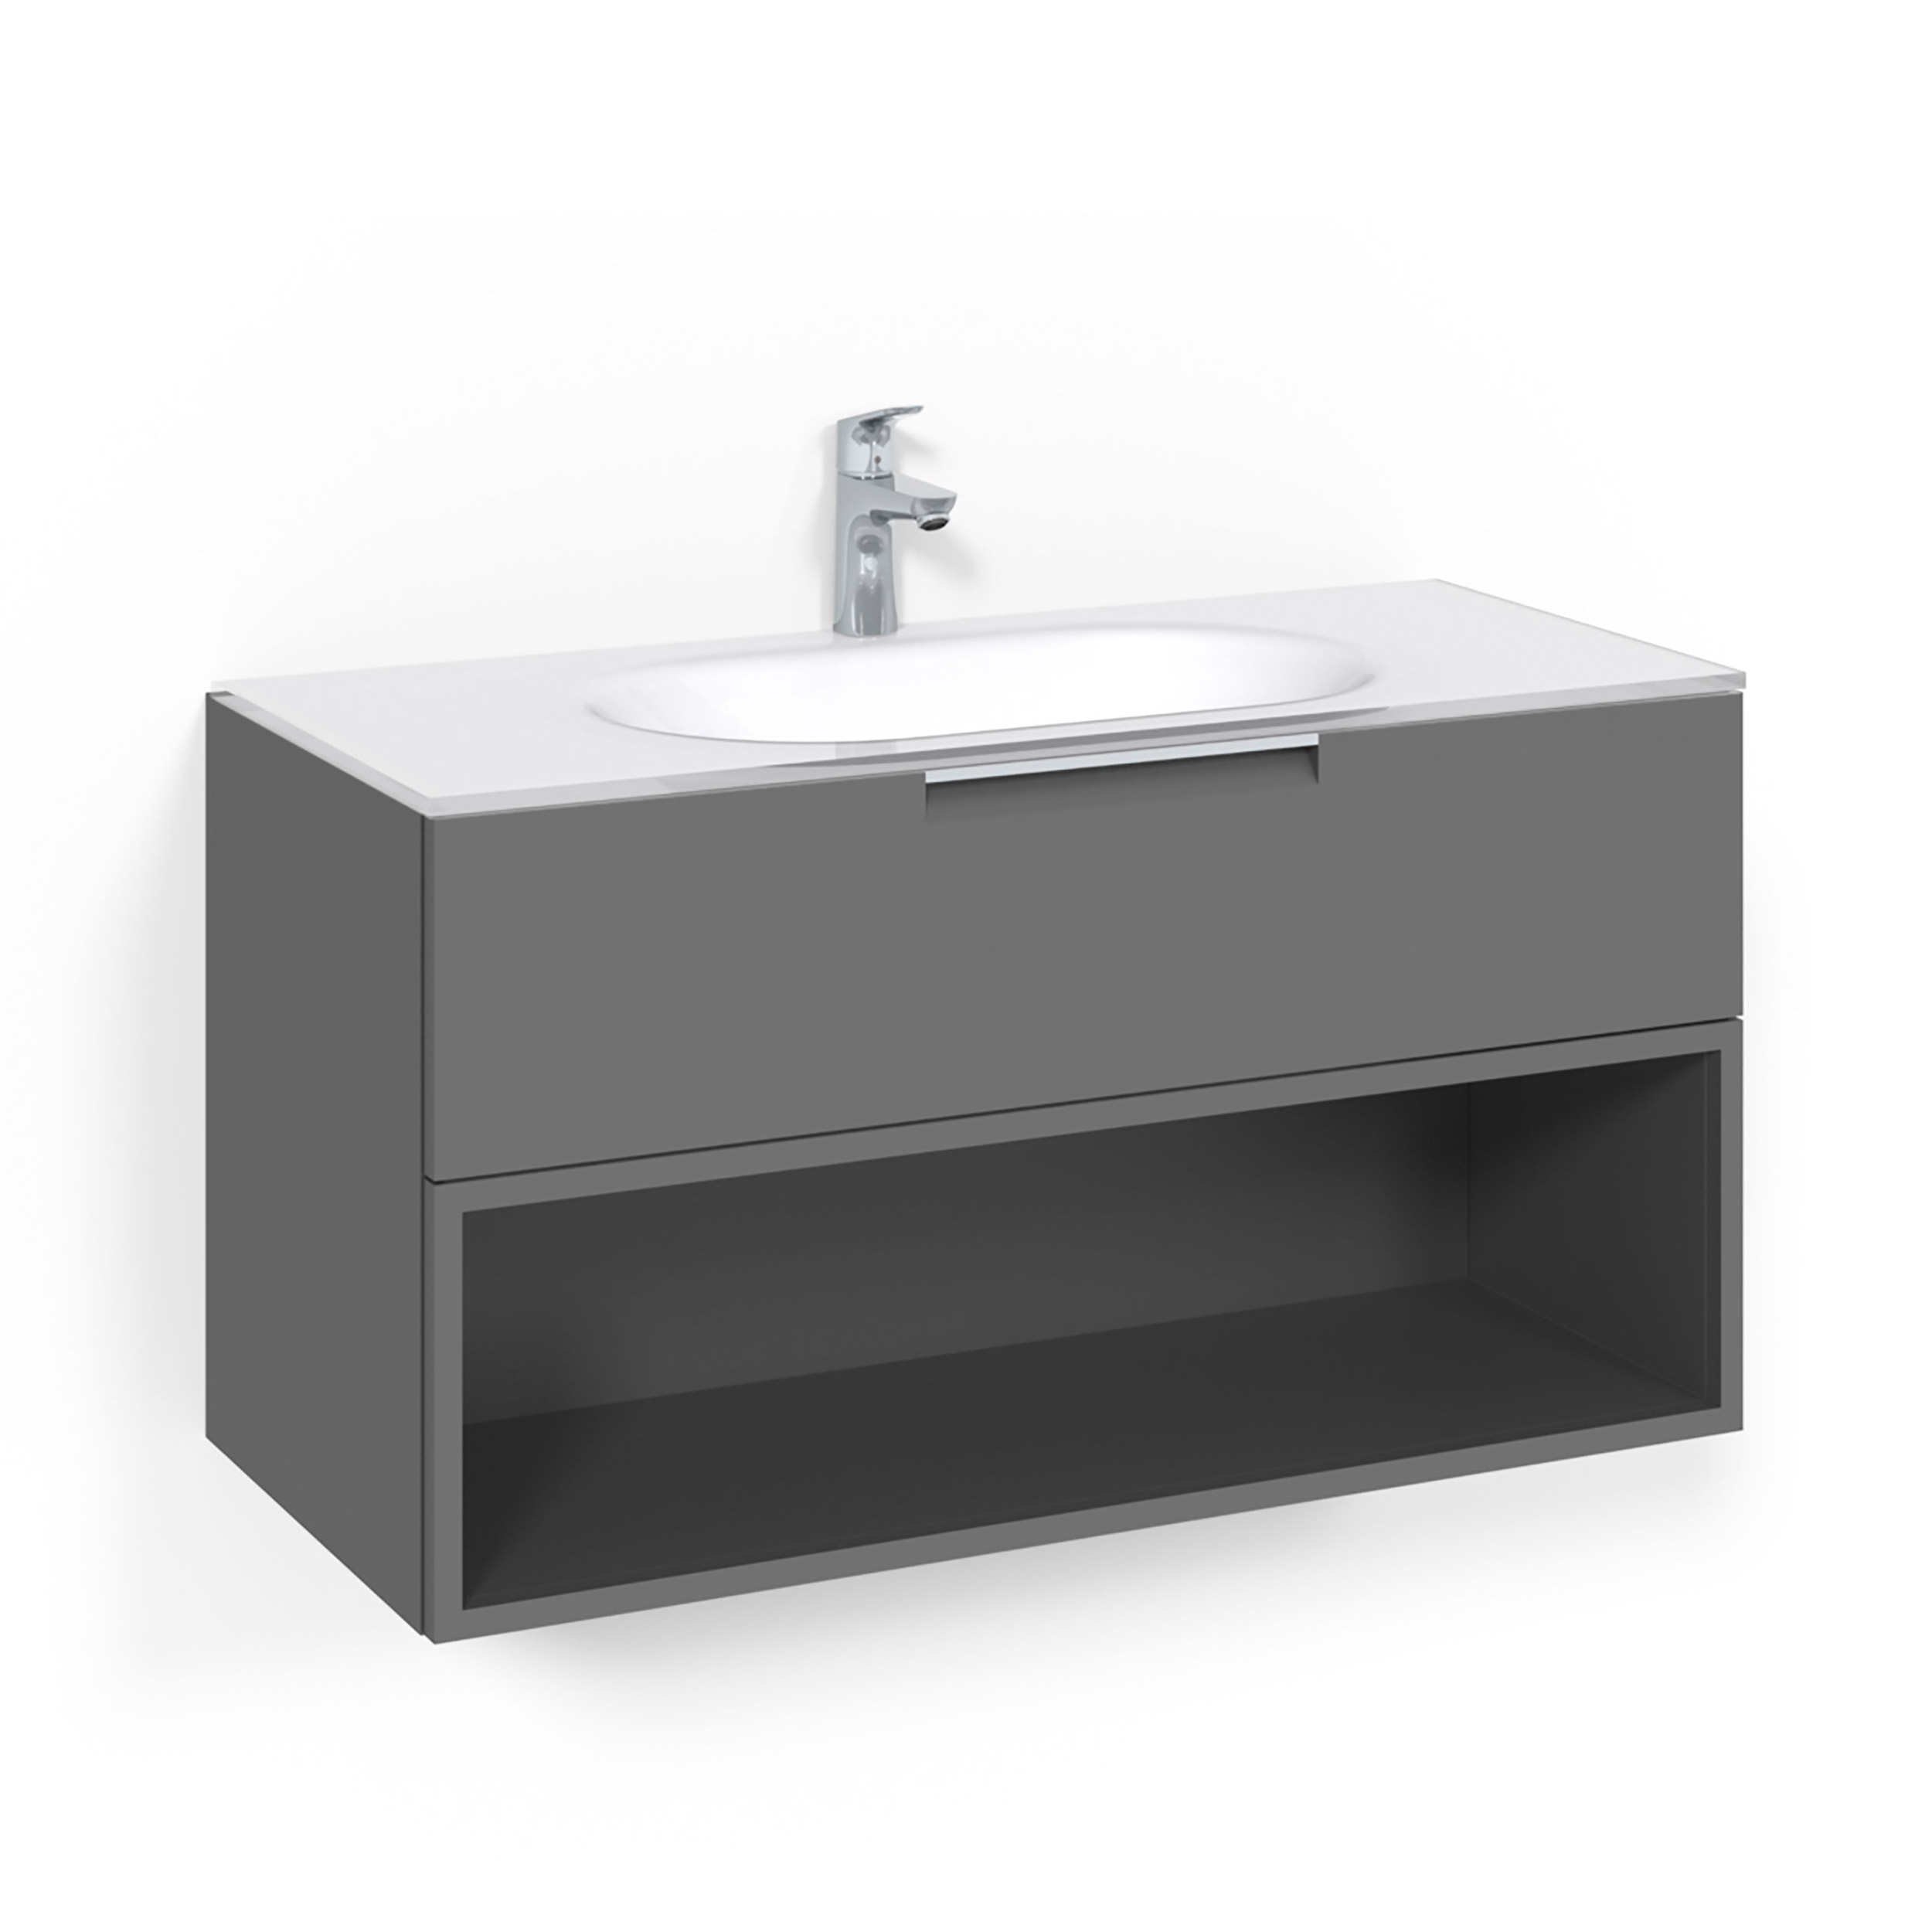 Tvättställsskåp Macro Design Crown Open Box Med Glastvättställ